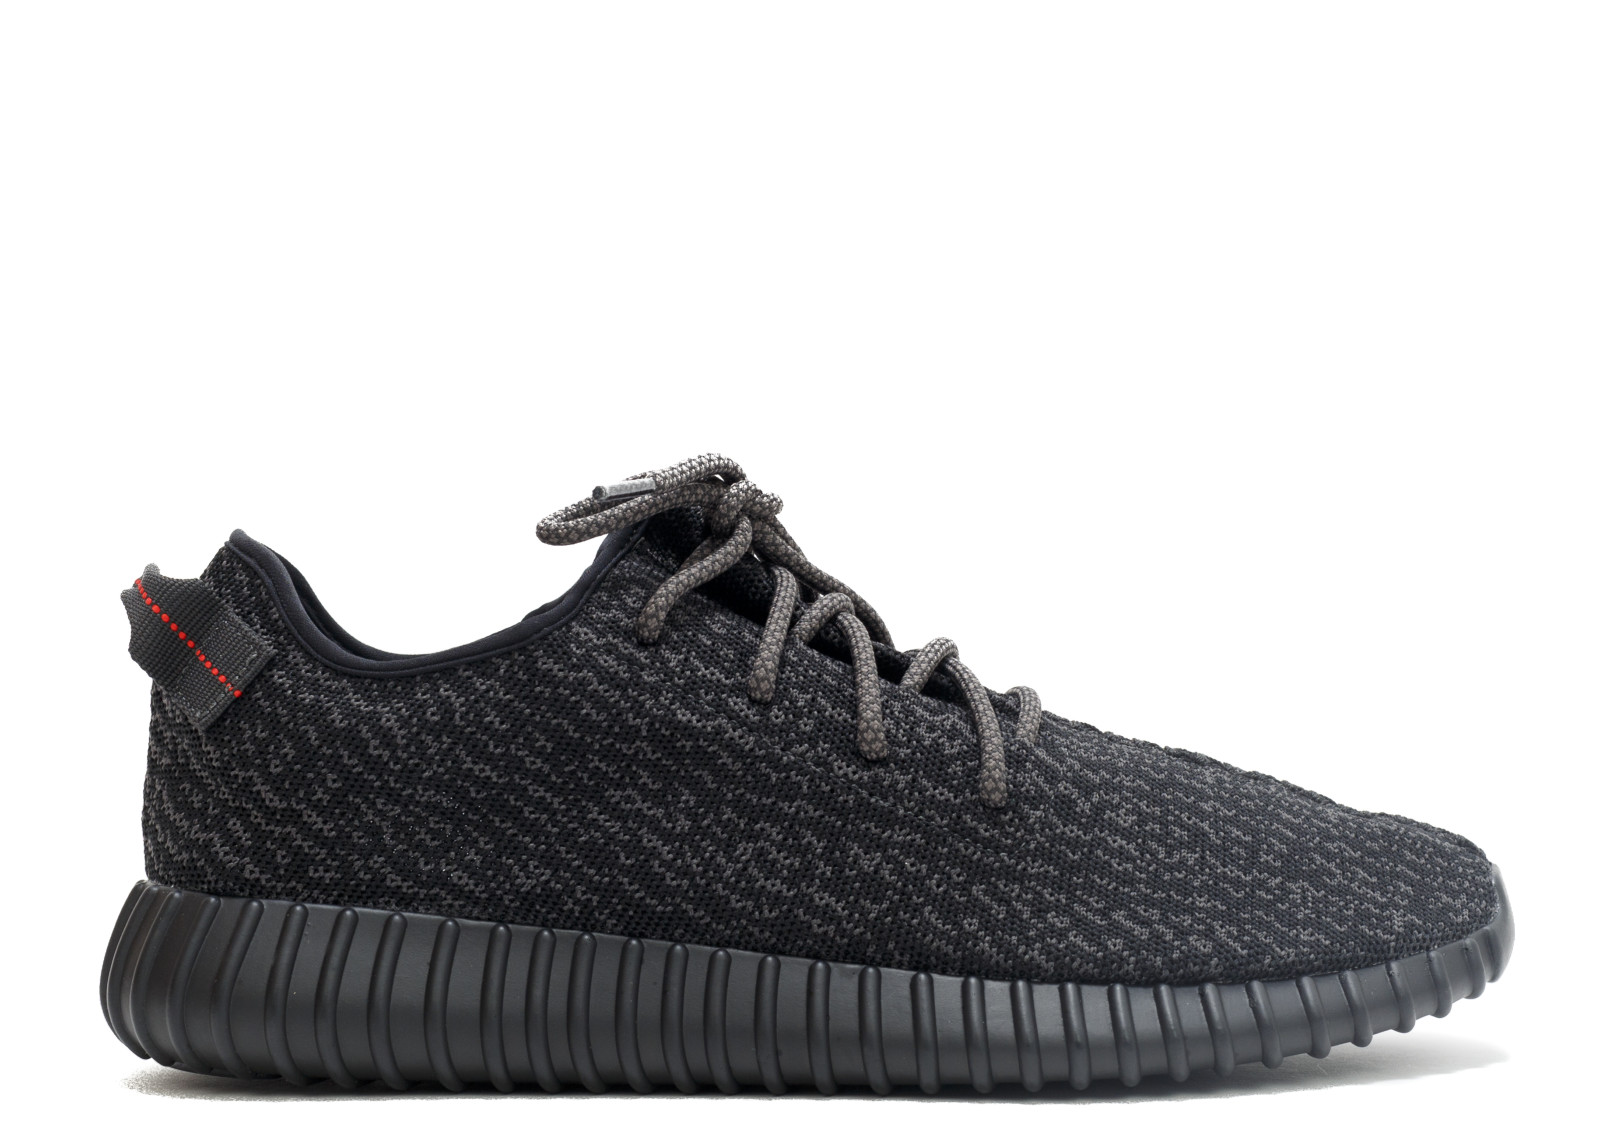 b68be0a3f0595 63611743004 adidas yeezy boost 350 pirate black 2016 release pirblk blugra  cblack 201189 1 original